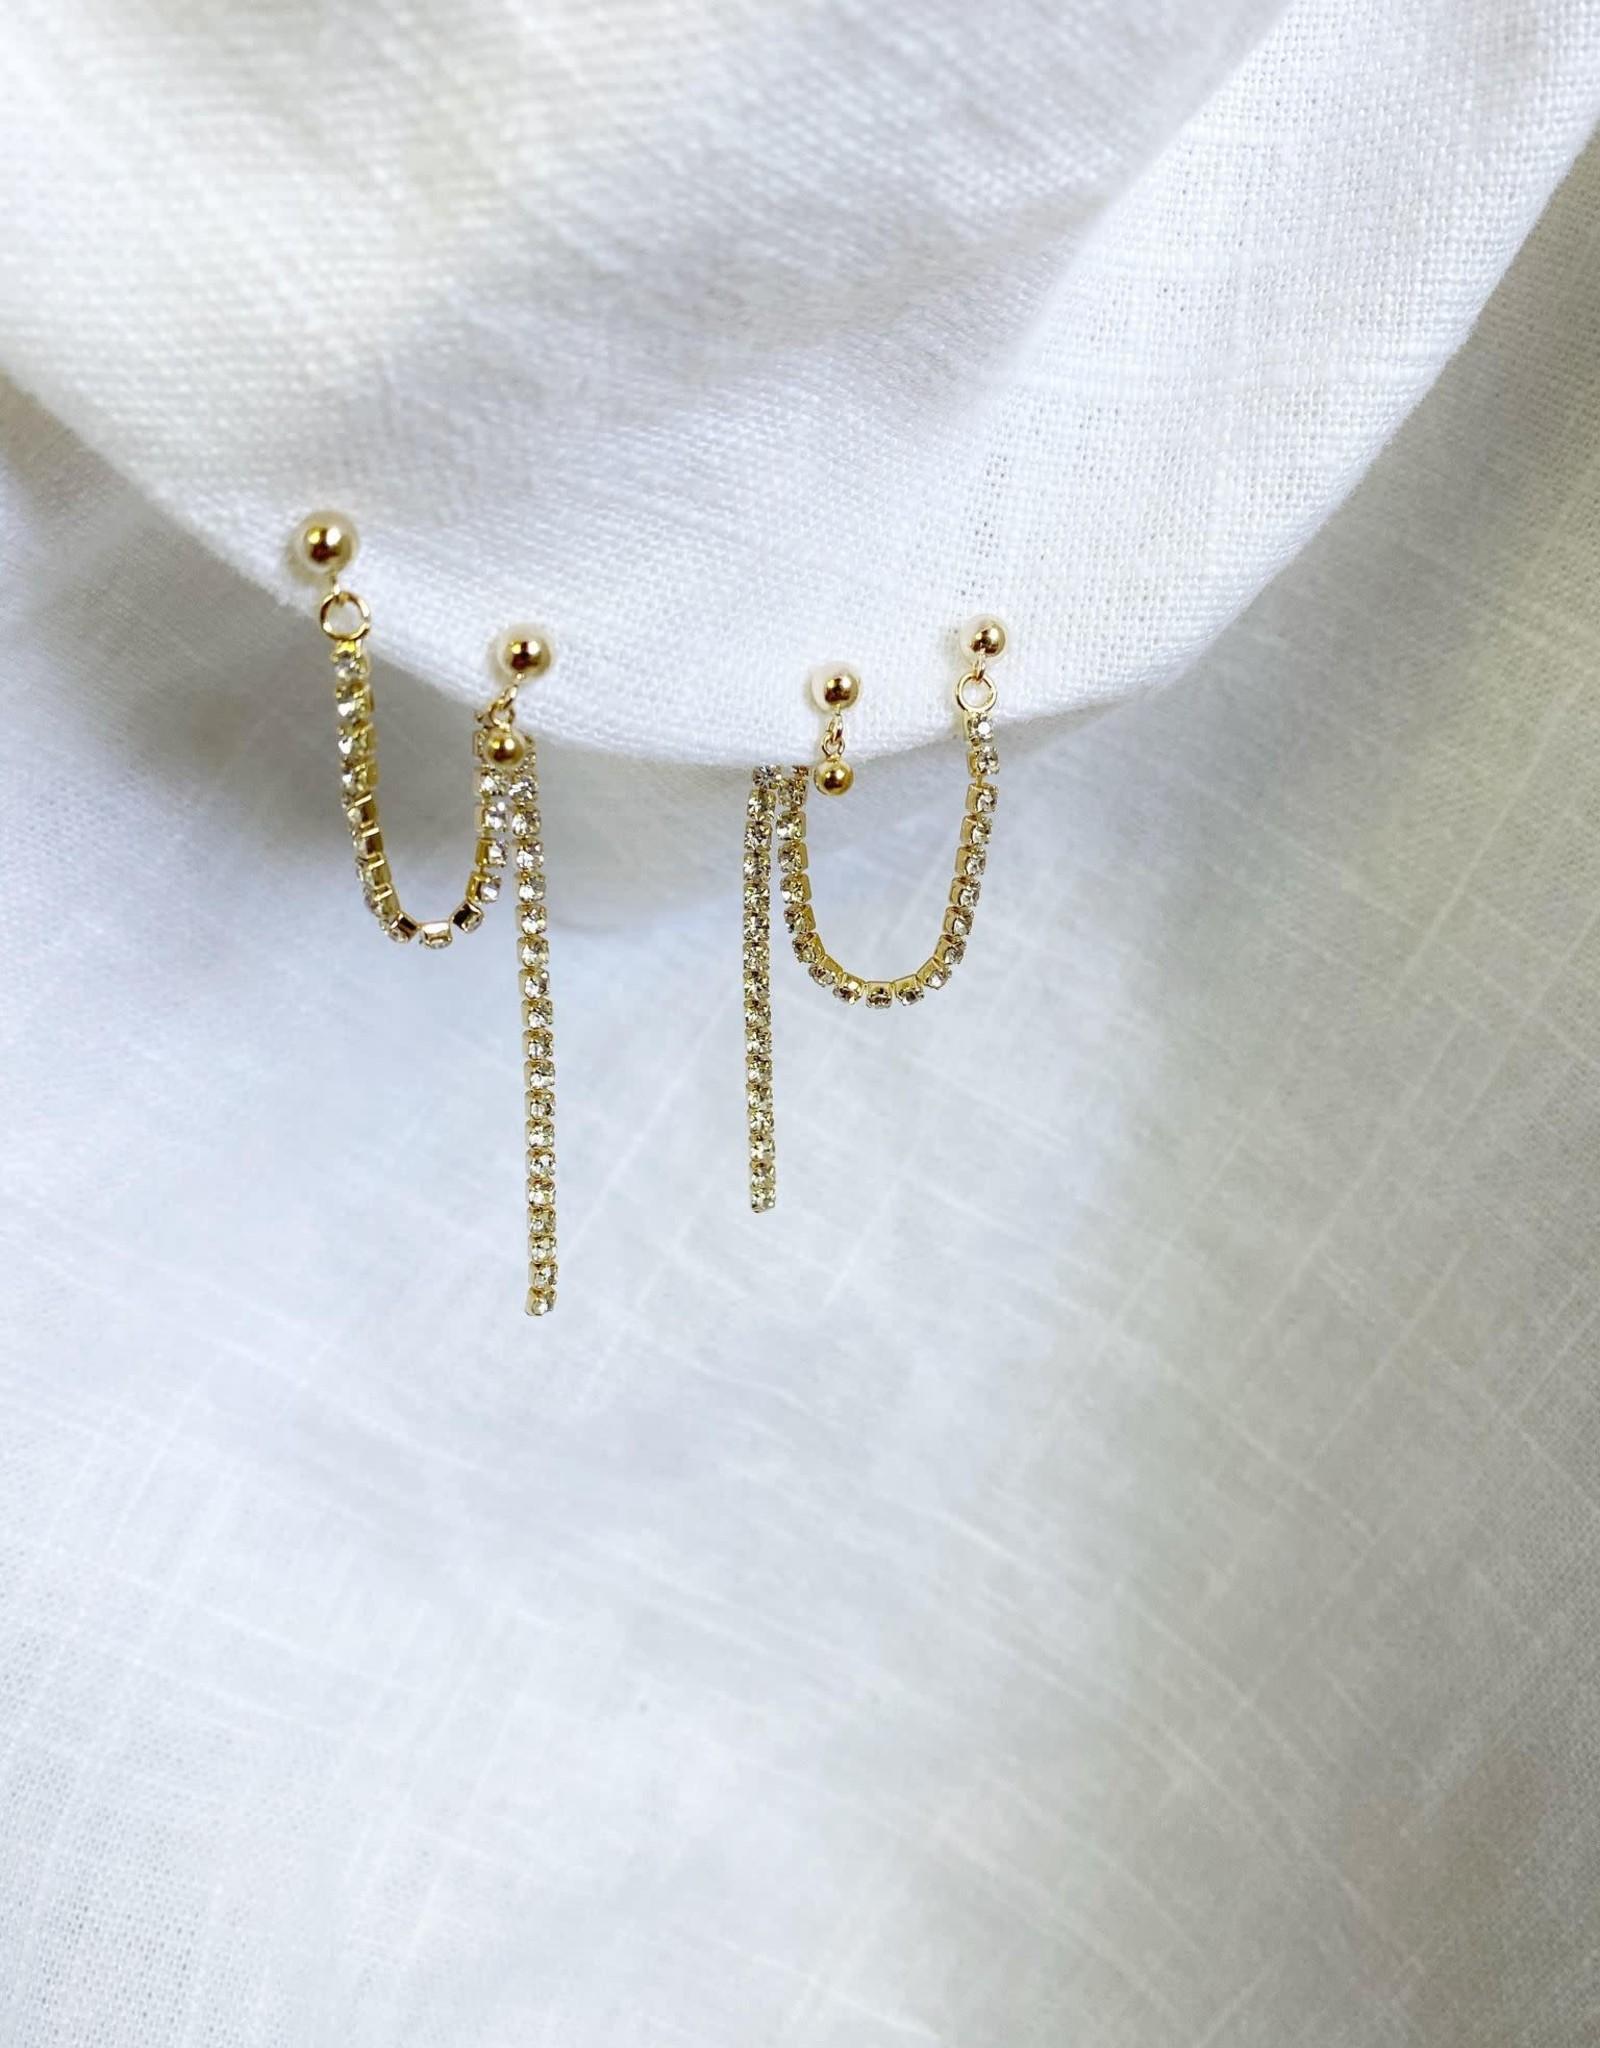 Bofemme Bofemme Glitz Drop Earrings